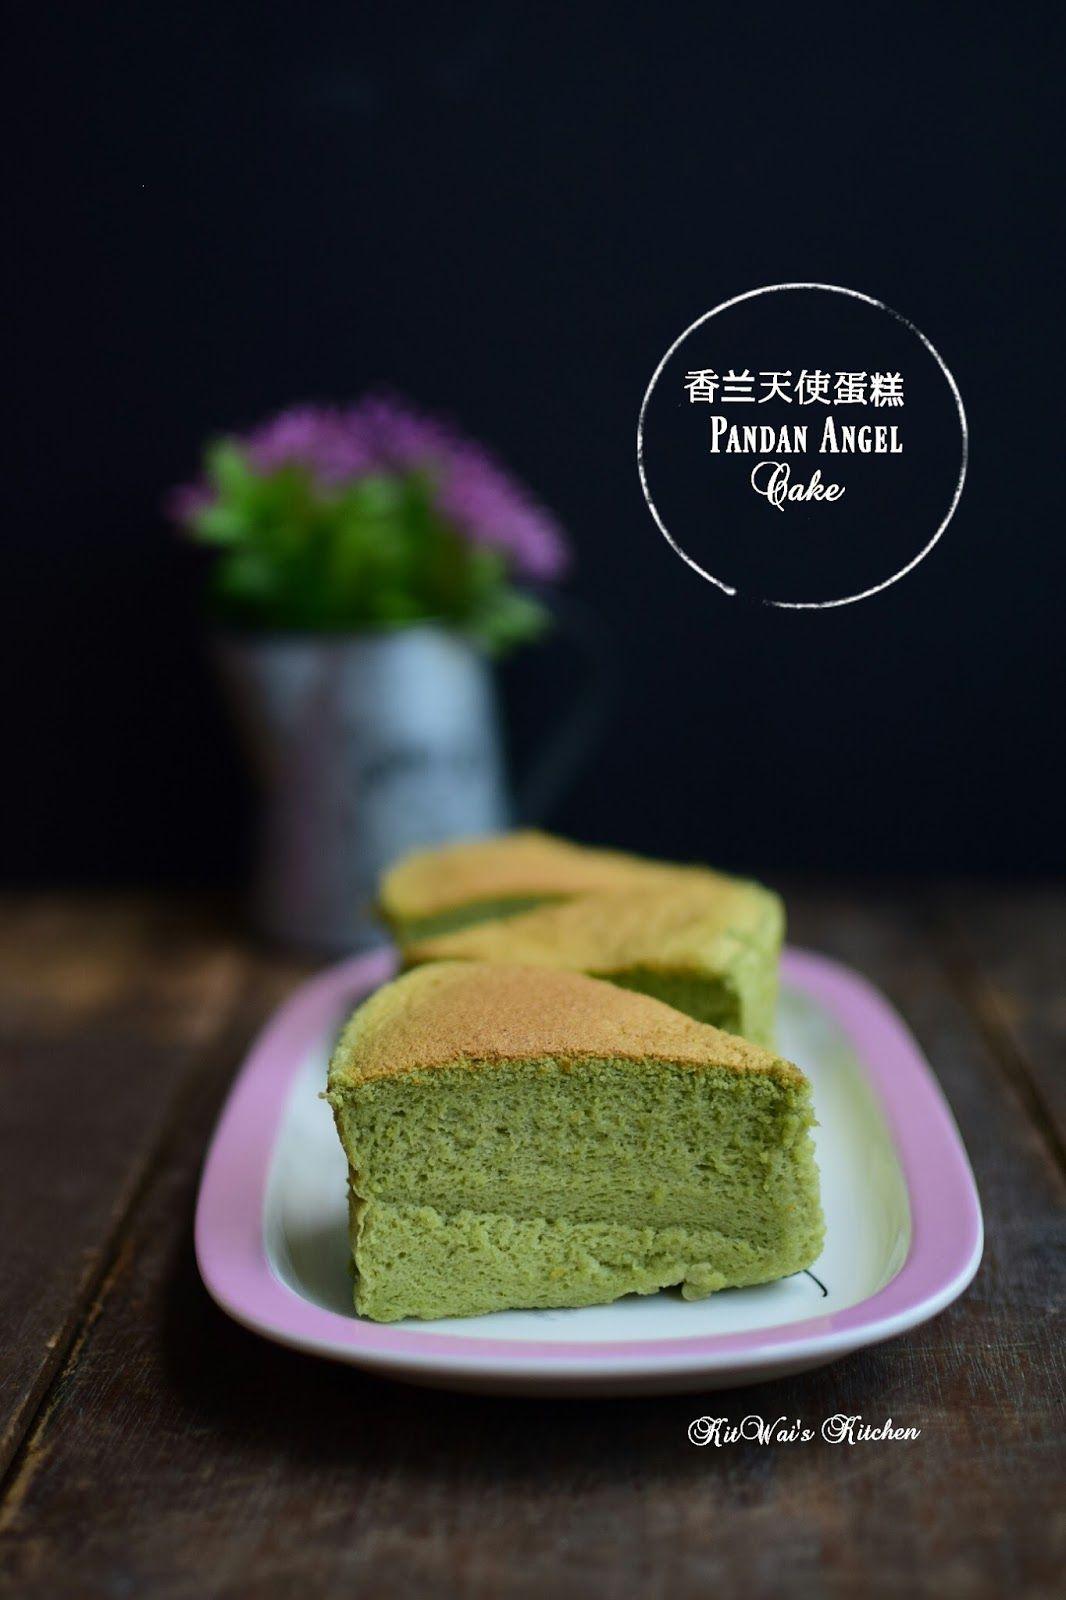 Kit Waiu0027s Kitchen : 香兰天使蛋糕 ~ Pandan Angel Cake